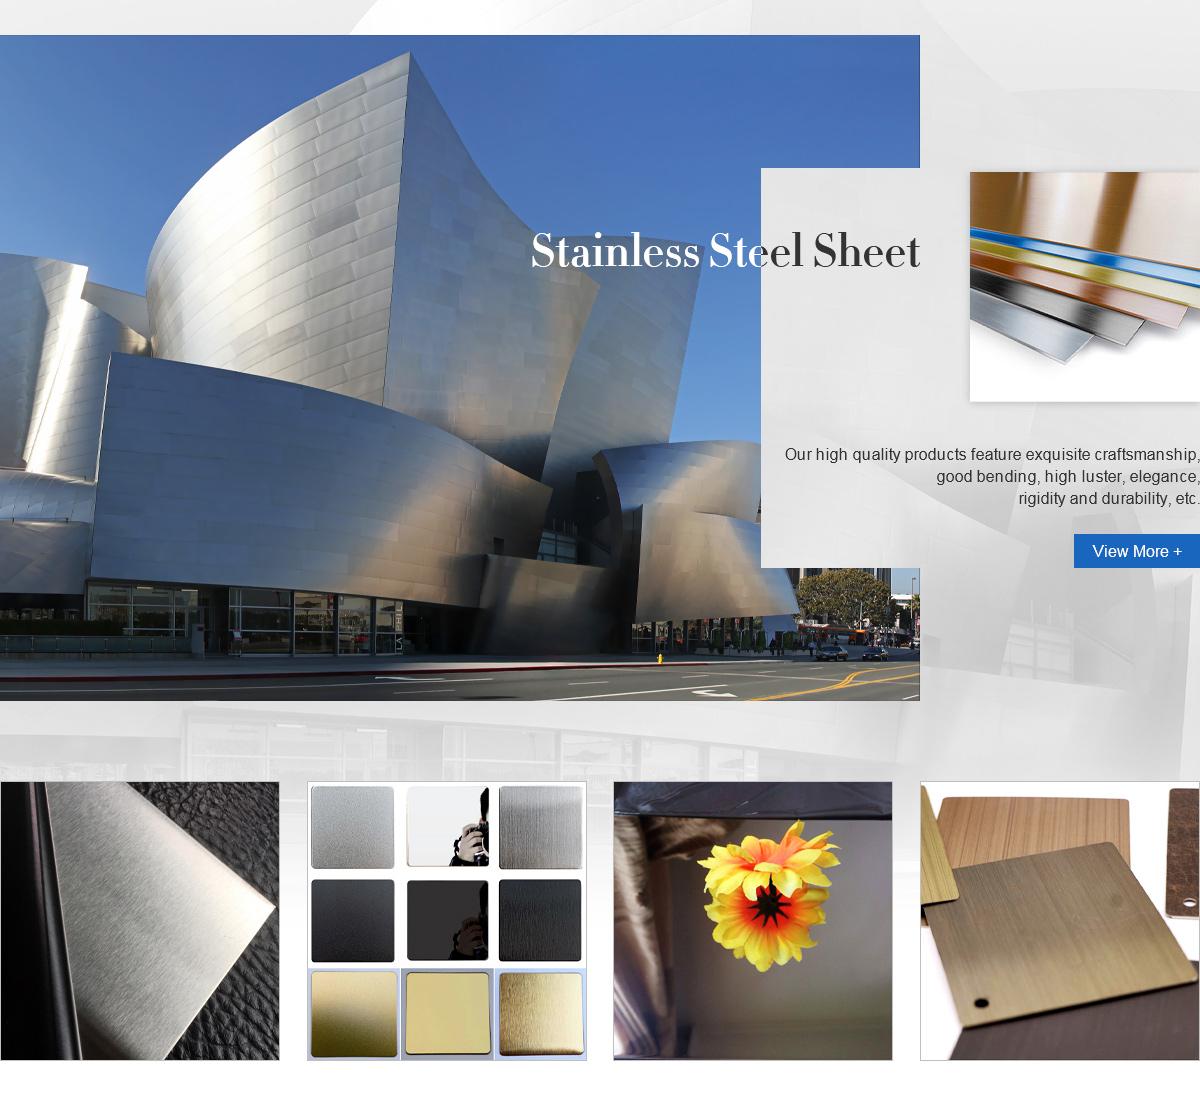 Foshan Shangfa Stainless Steel Co Ltd